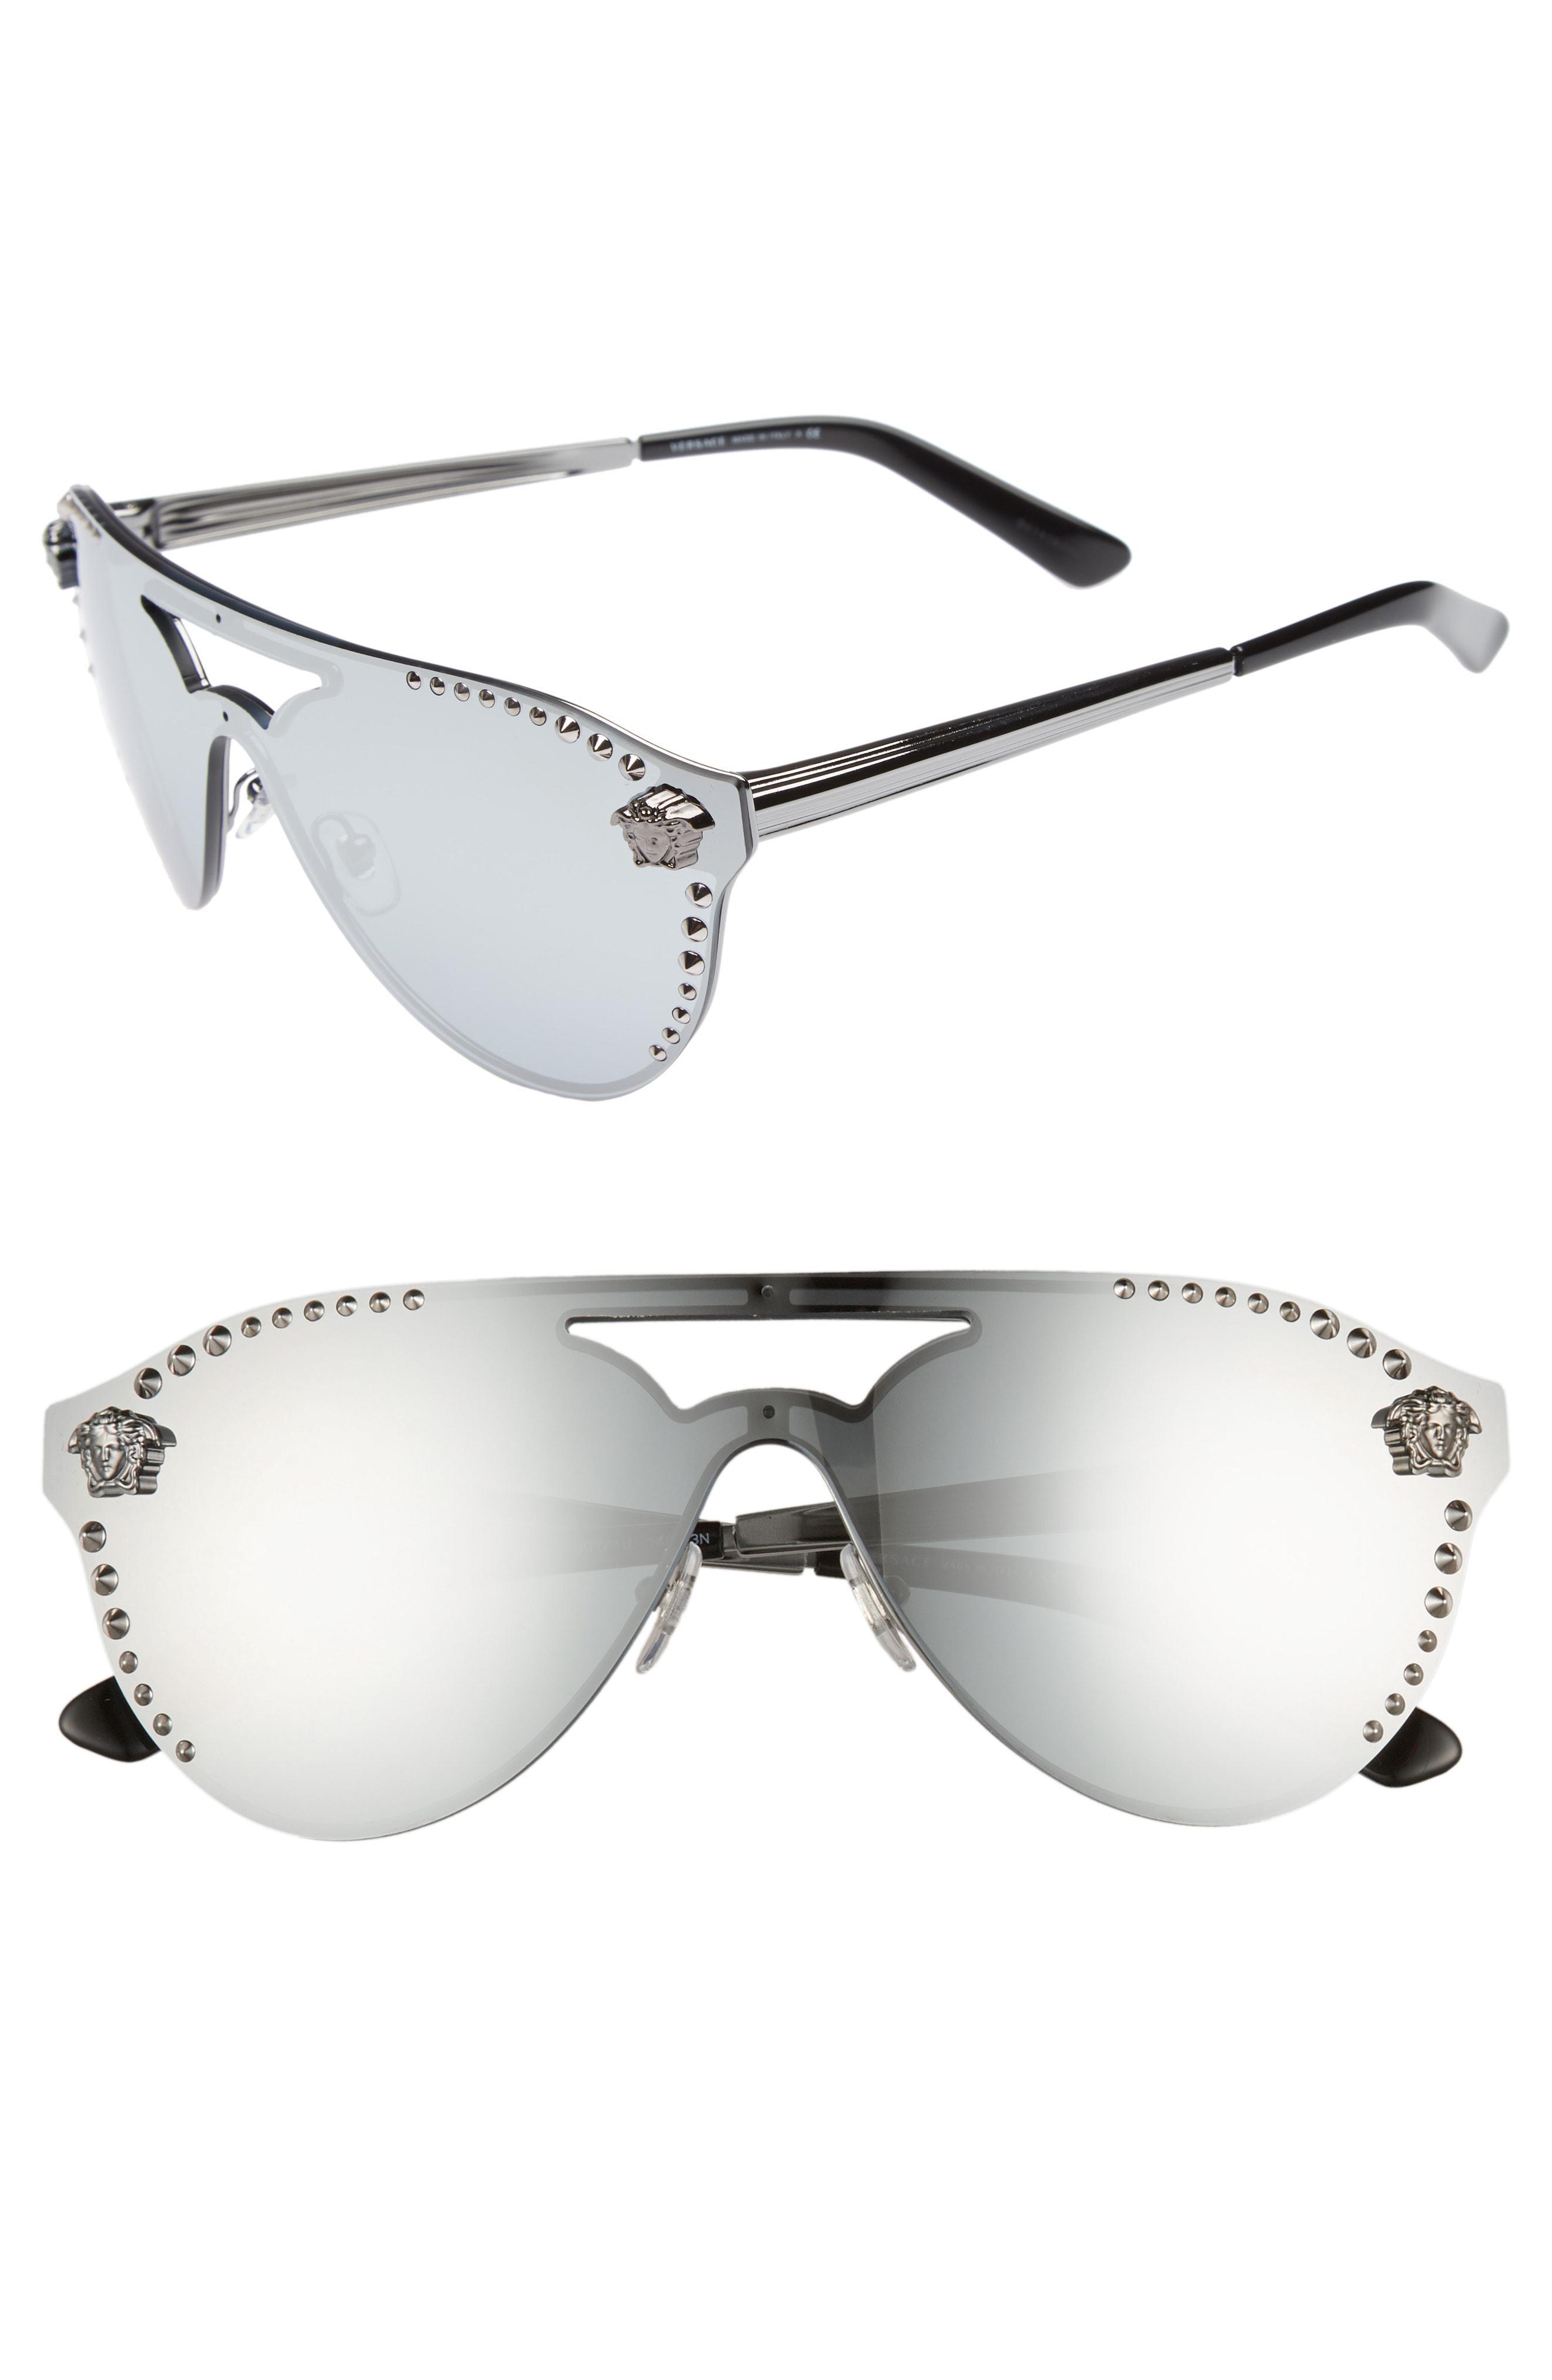 b3f4ac15e Lyst - Versace 60mm Shield Mirrored Sunglasses - Gunmetal Mirror in ...